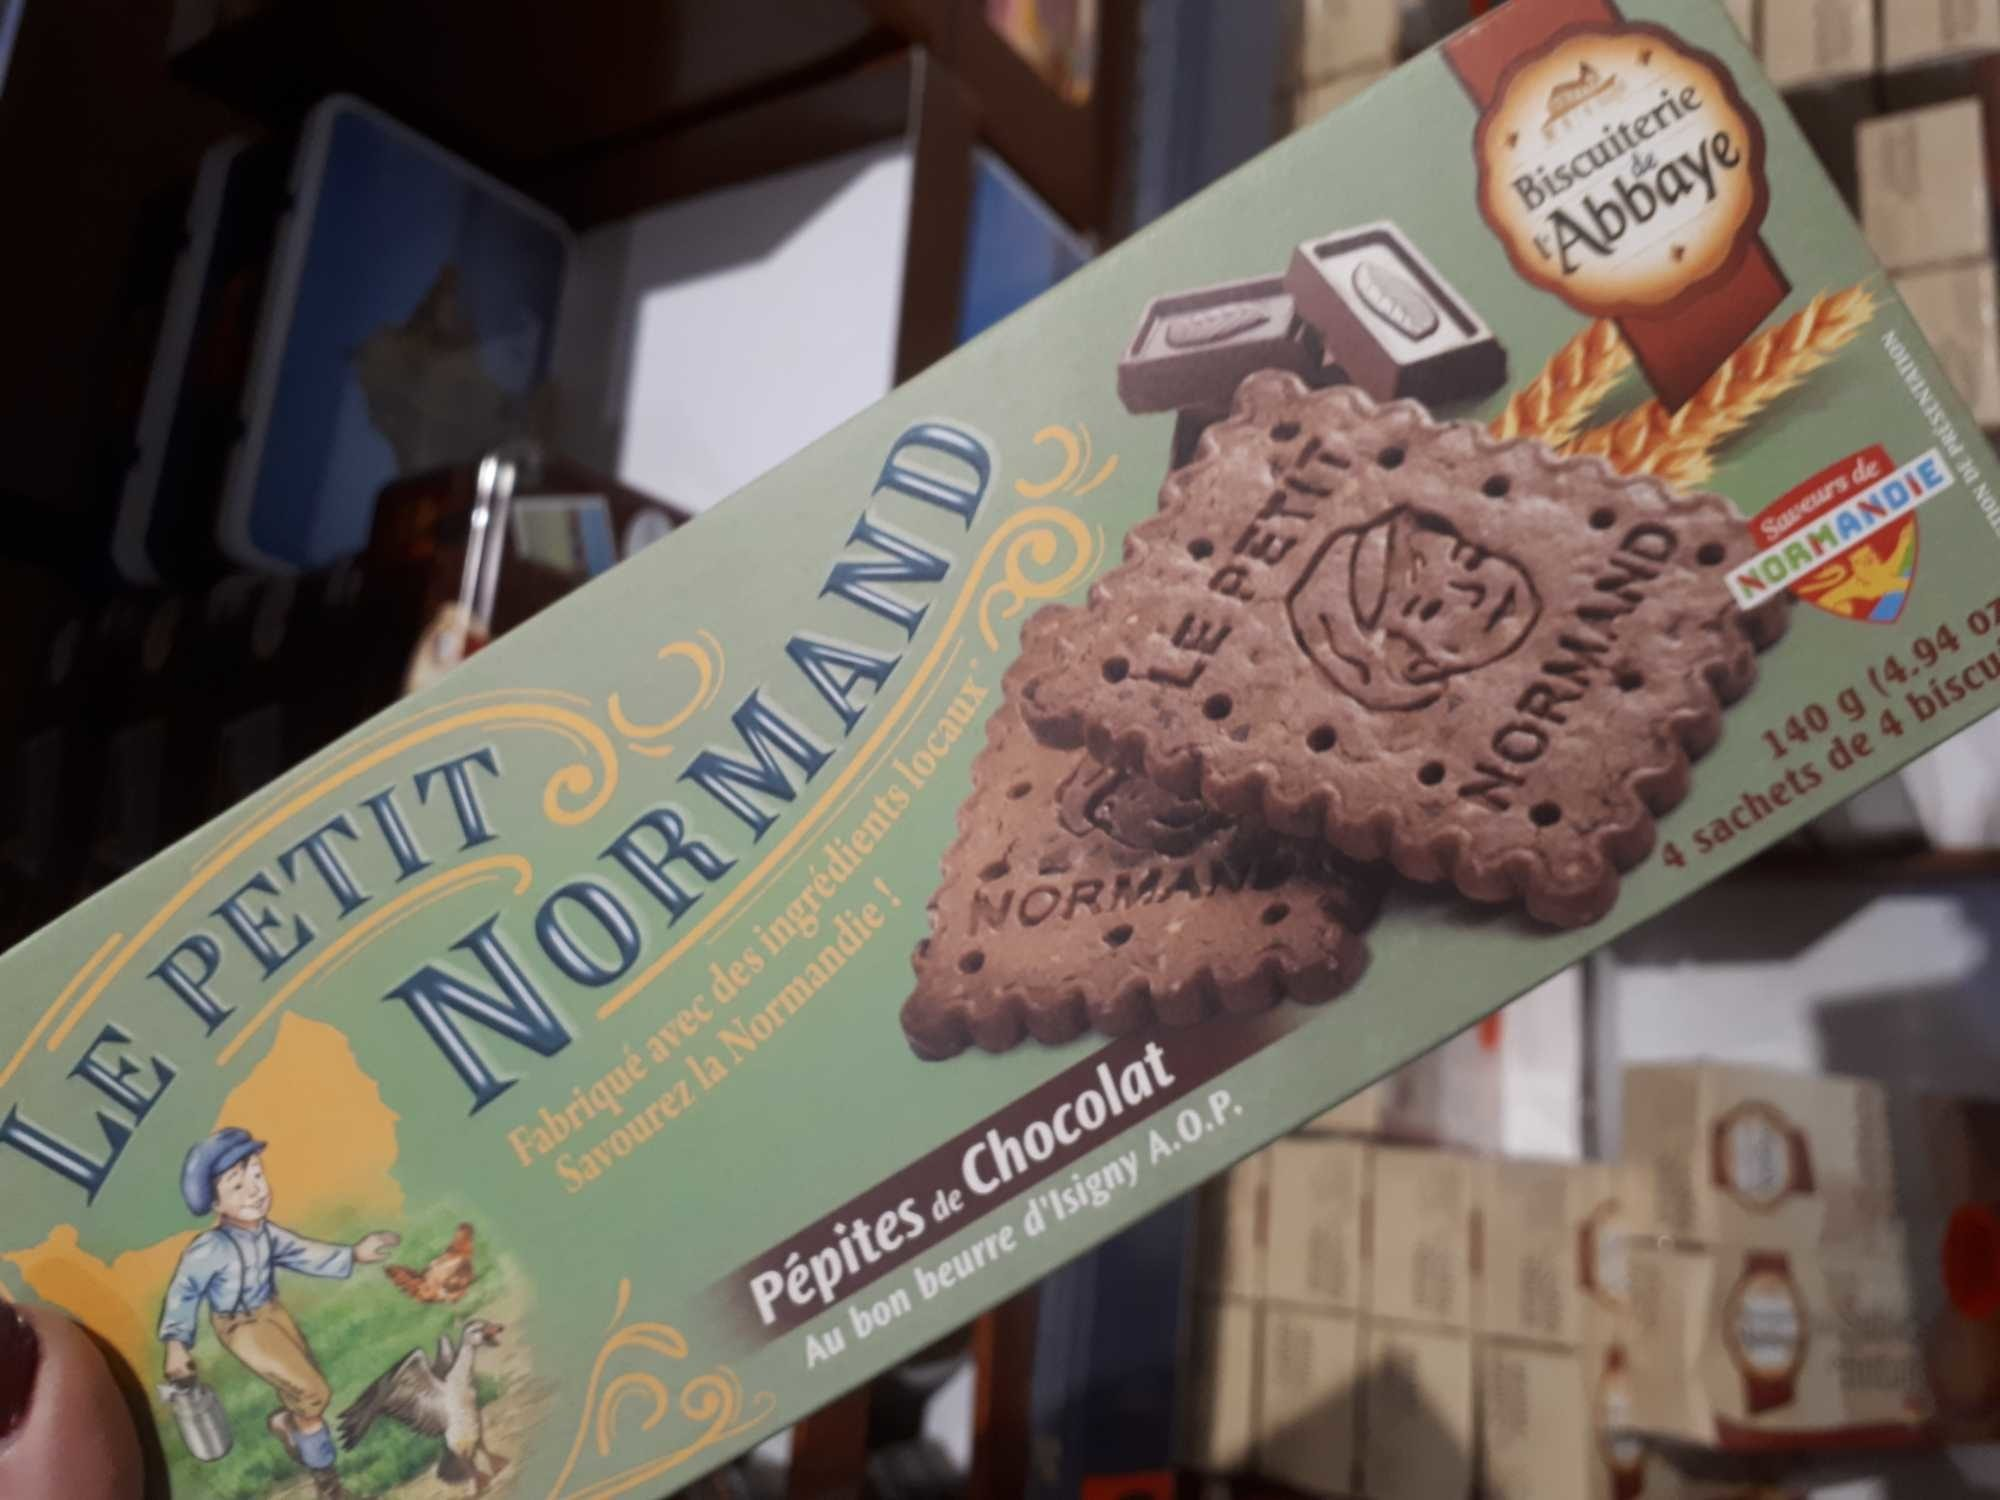 140G Petit Normand P. chocolat Biscuiterie De L'abbaye - Producto